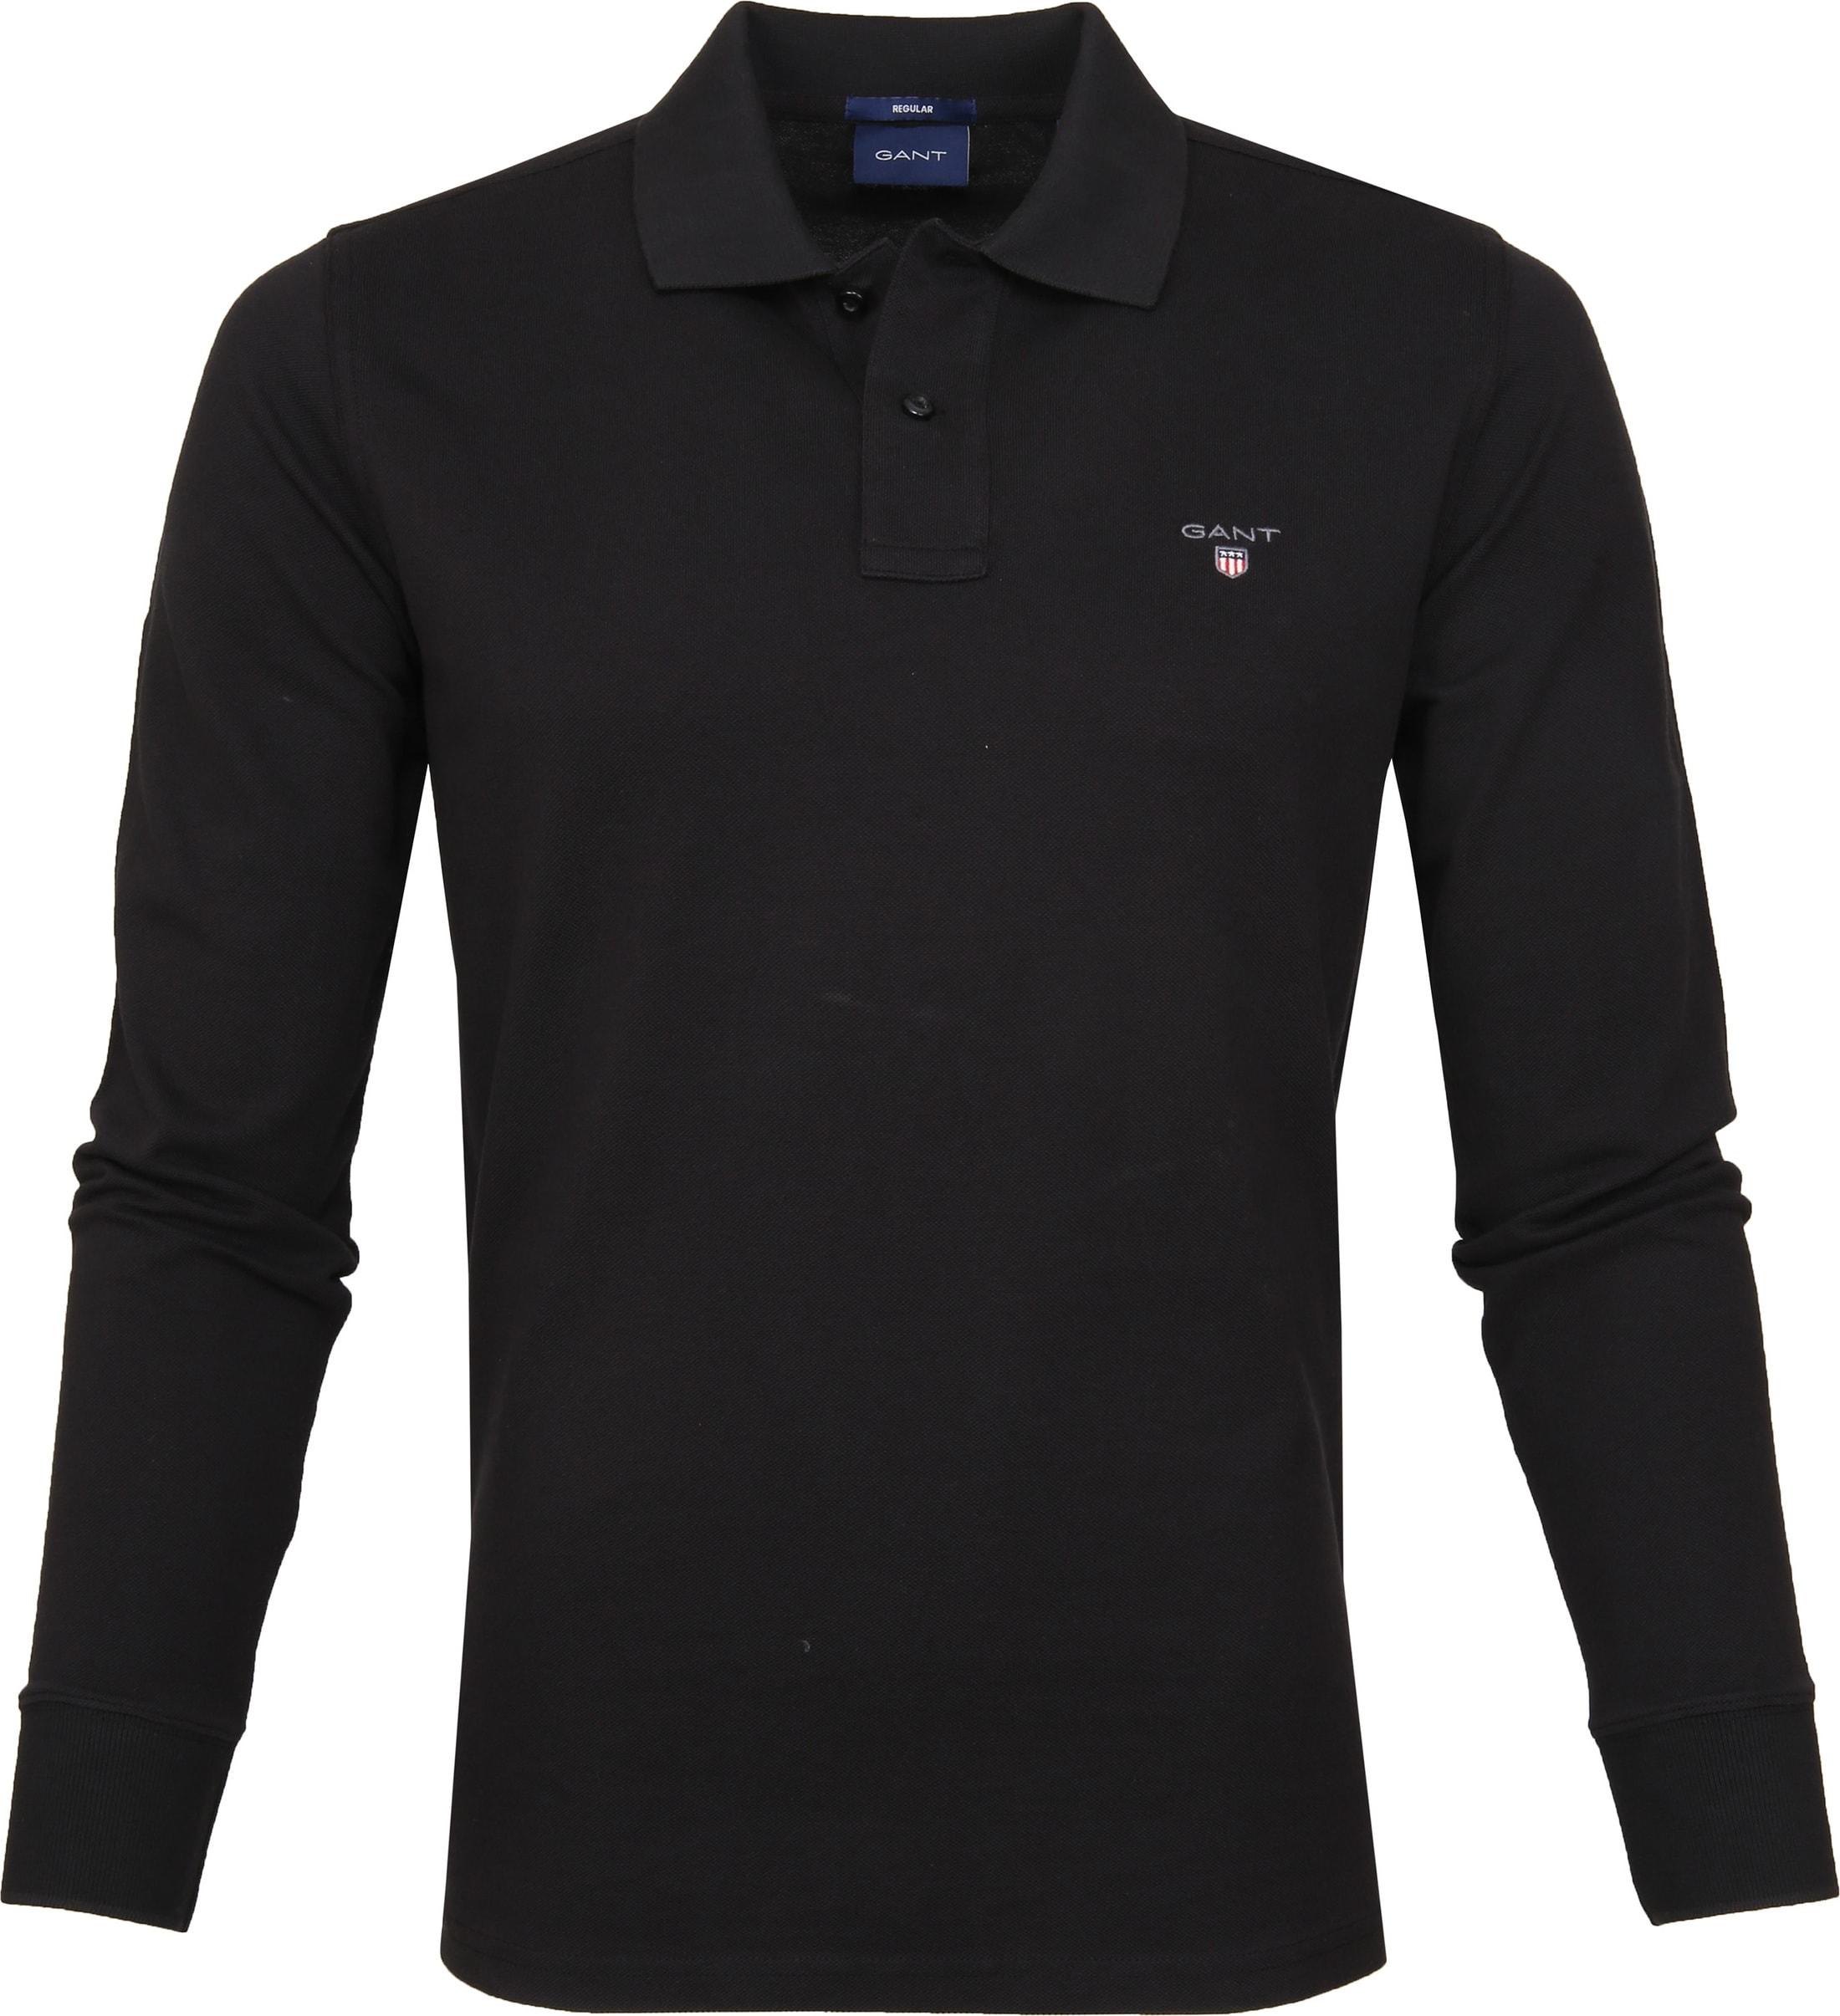 Gant Rugger Poloshirt LS Black foto 0